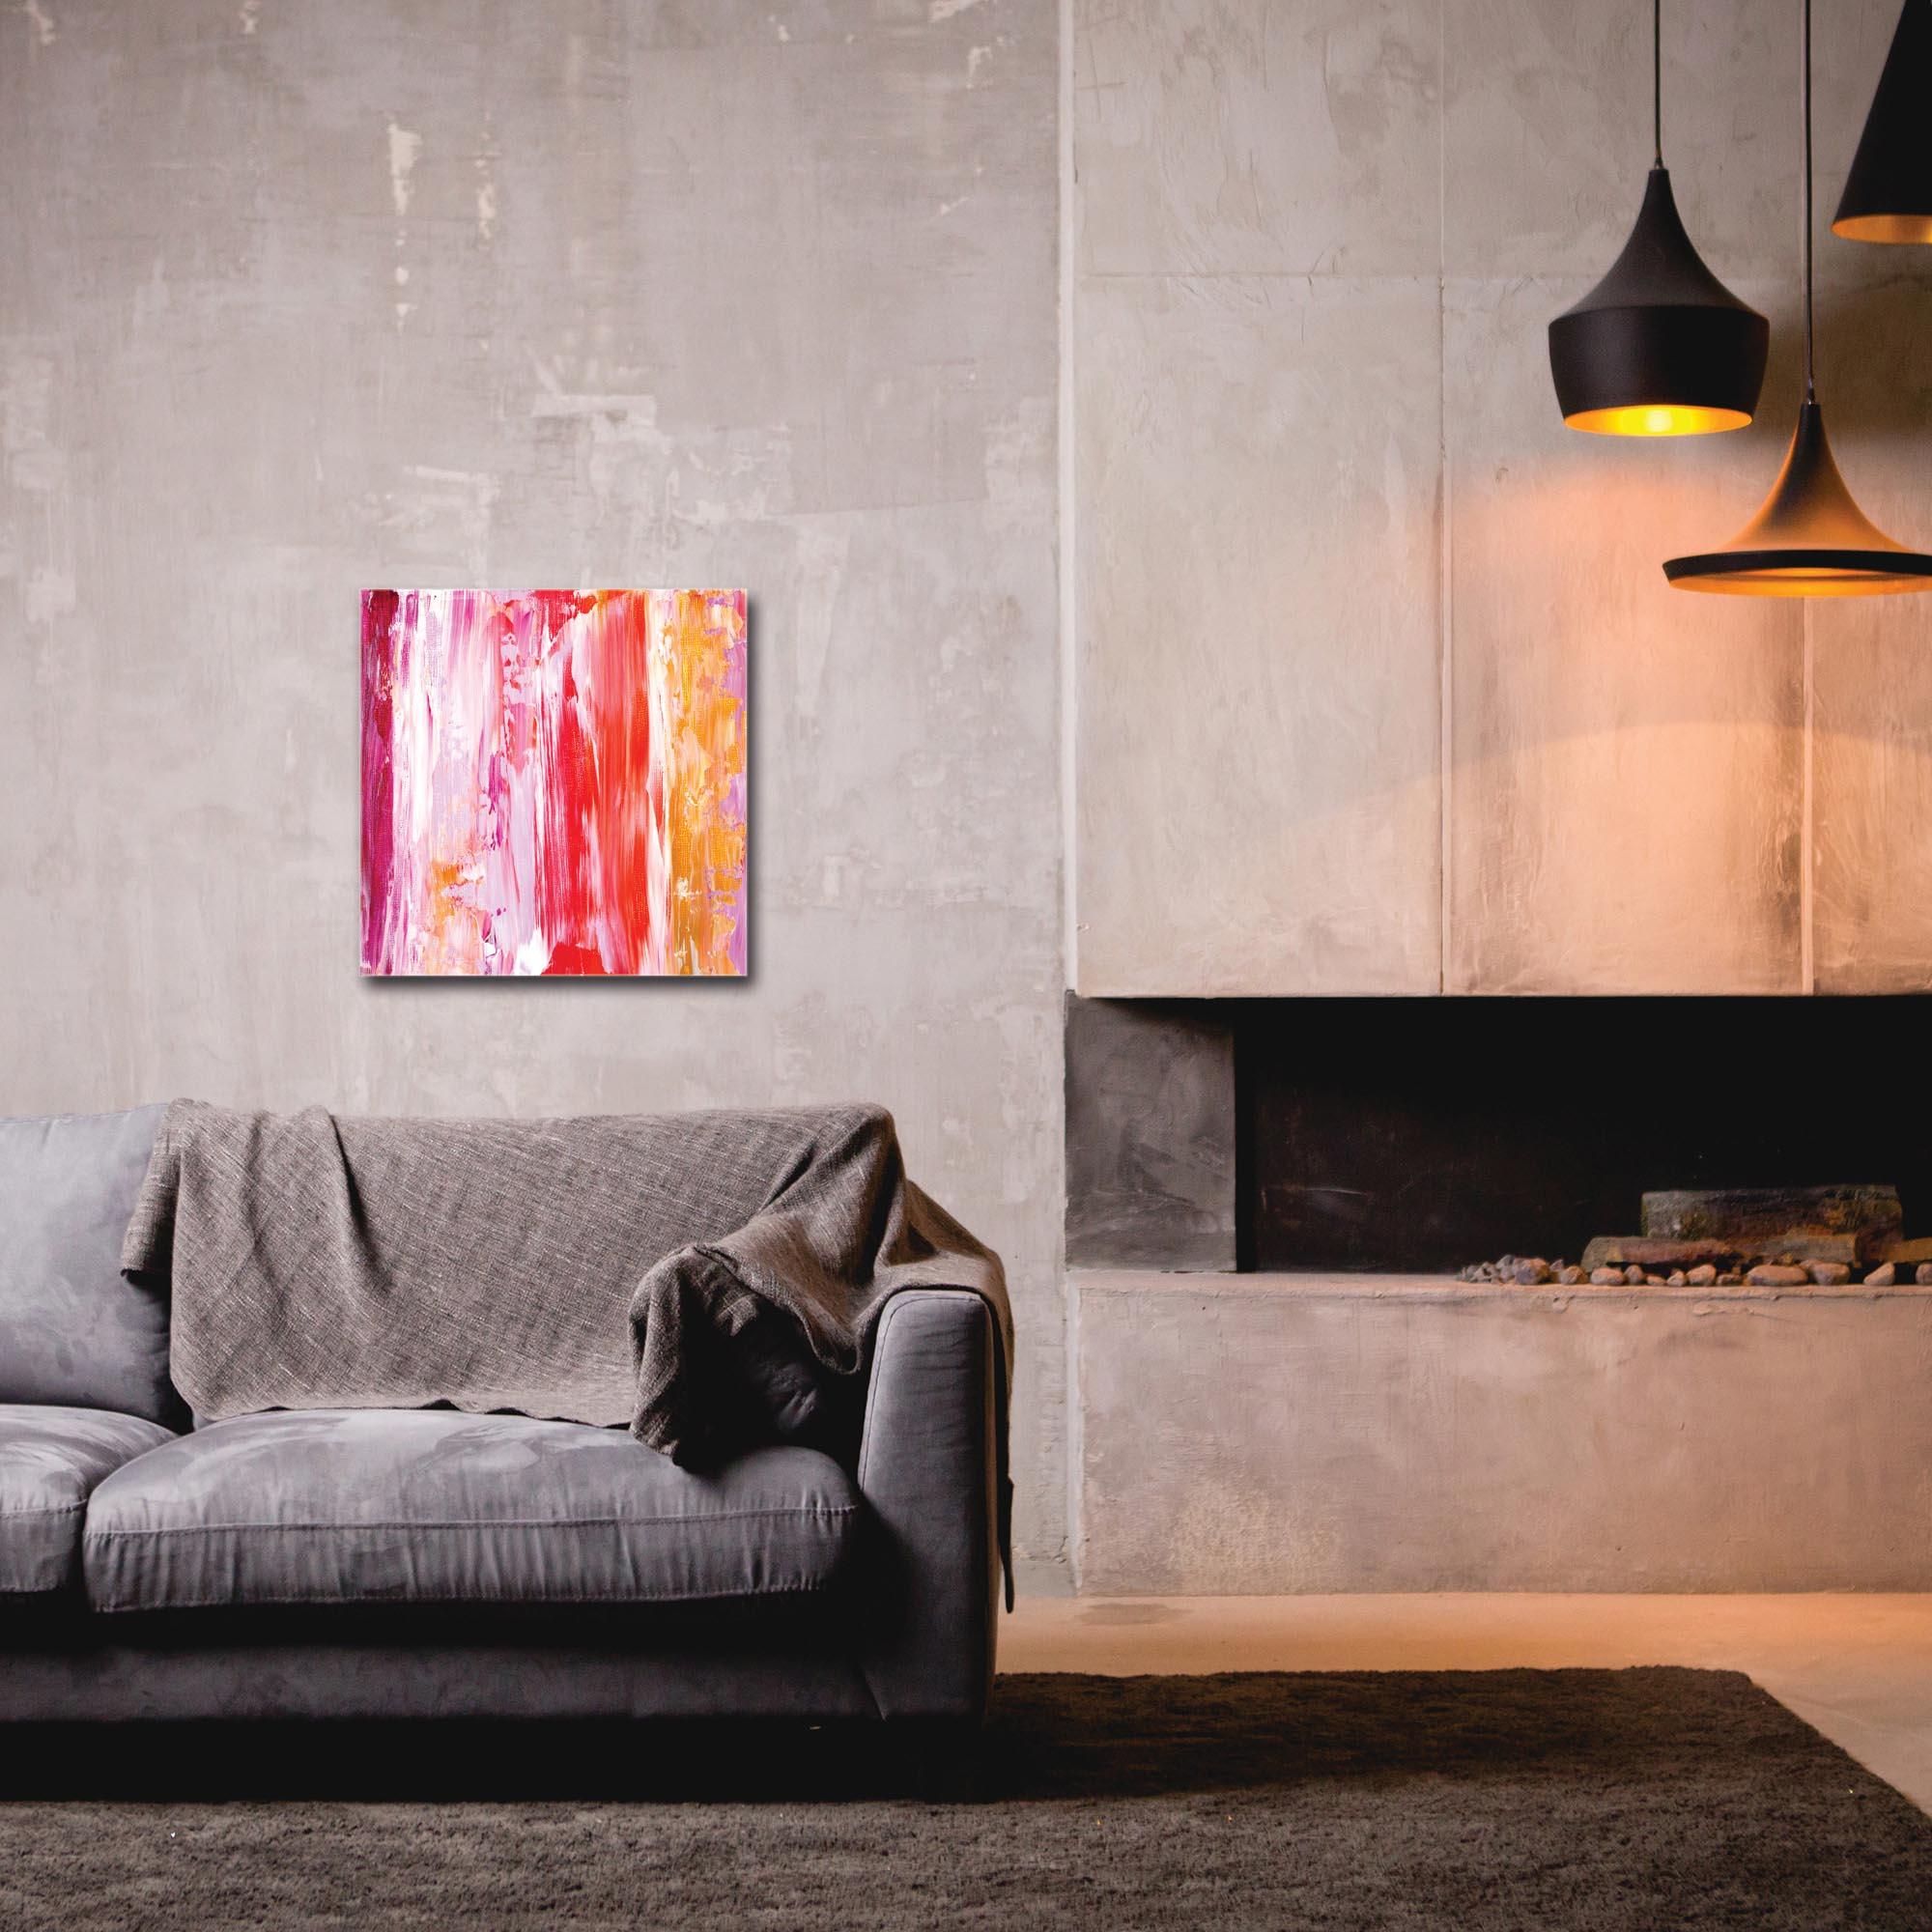 Abstract Wall Art 'Urban Life 4' - Urban Decor on Metal or Plexiglass - Image 3